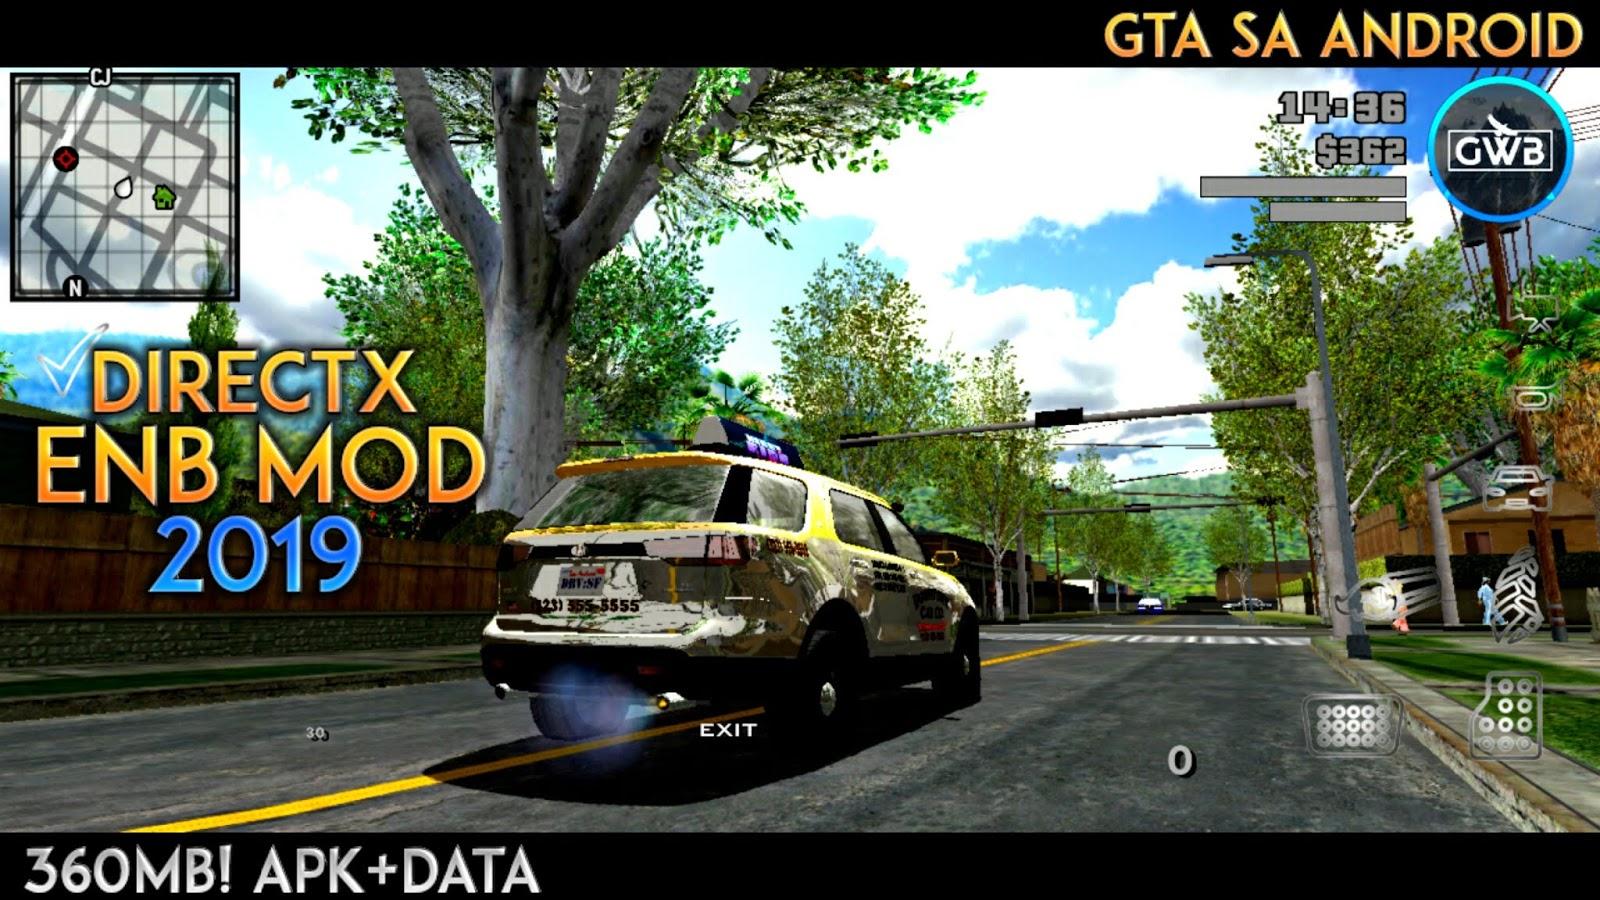 360MB] GTA SA LITE !! WOW ! DIRECTX ENB MODPACK | GTA SA